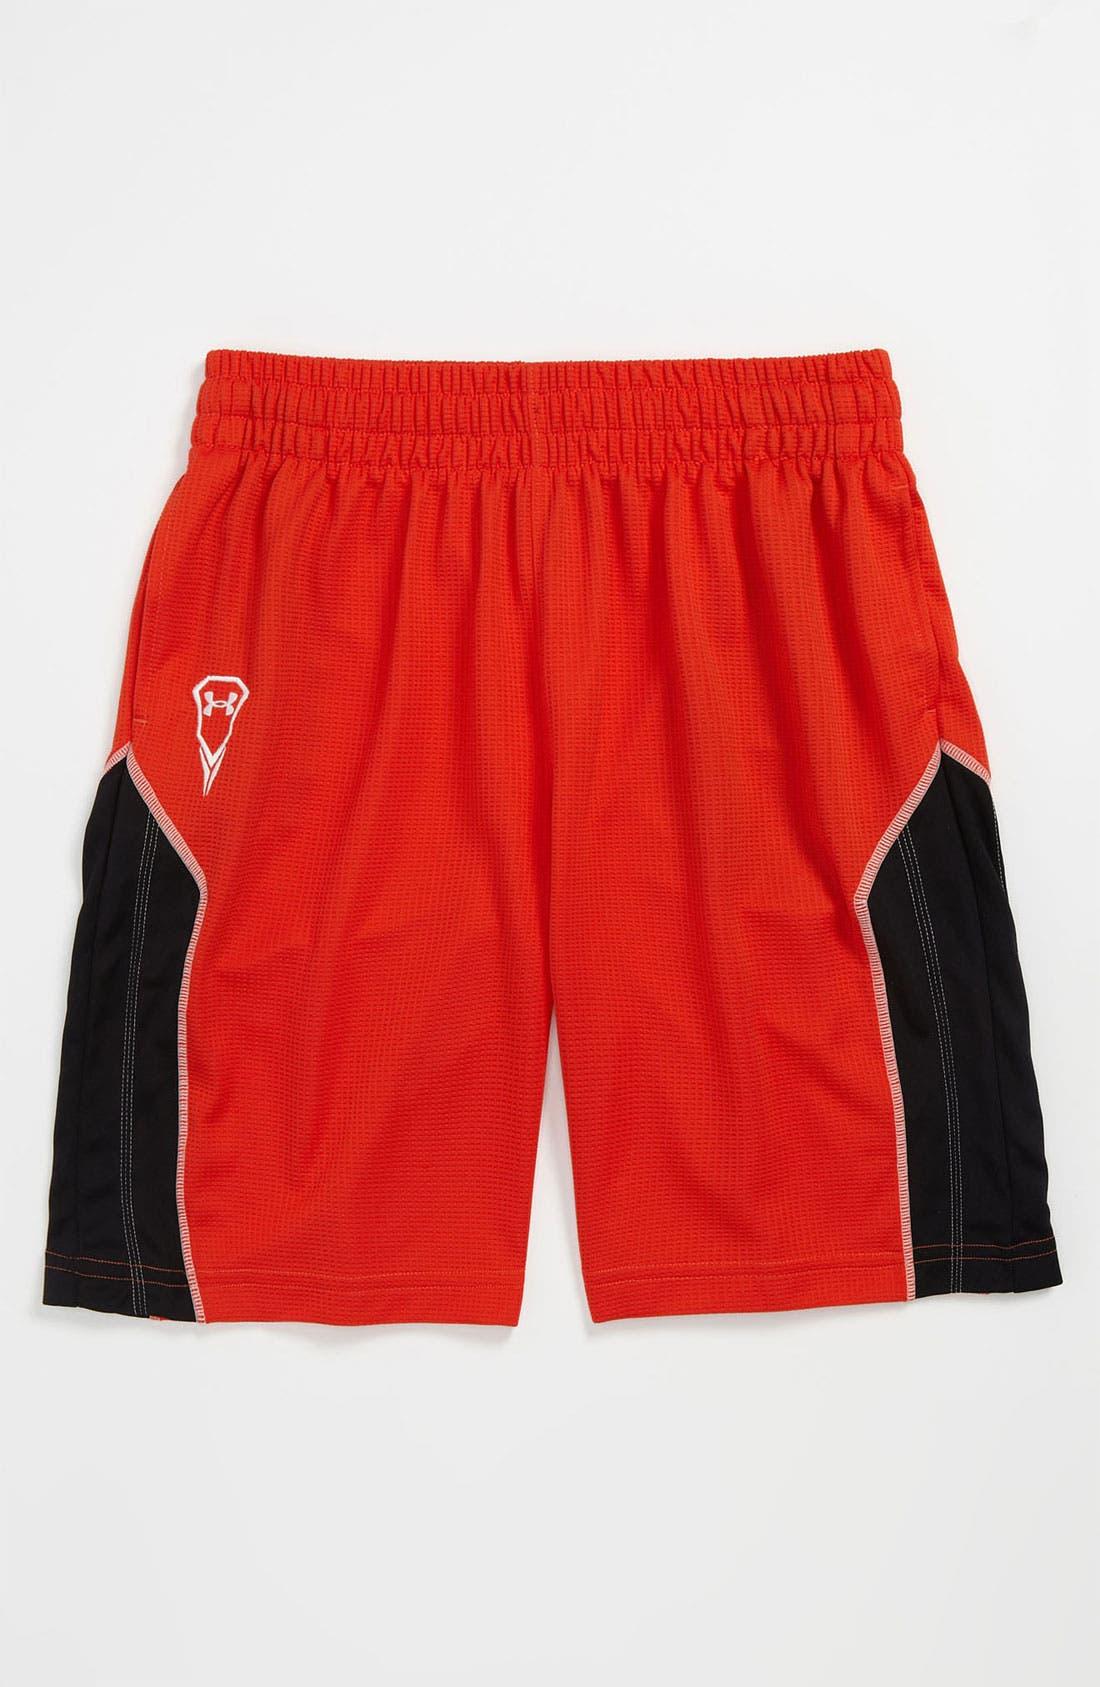 Alternate Image 1 Selected - Under Armour Shorts (Big Boys)